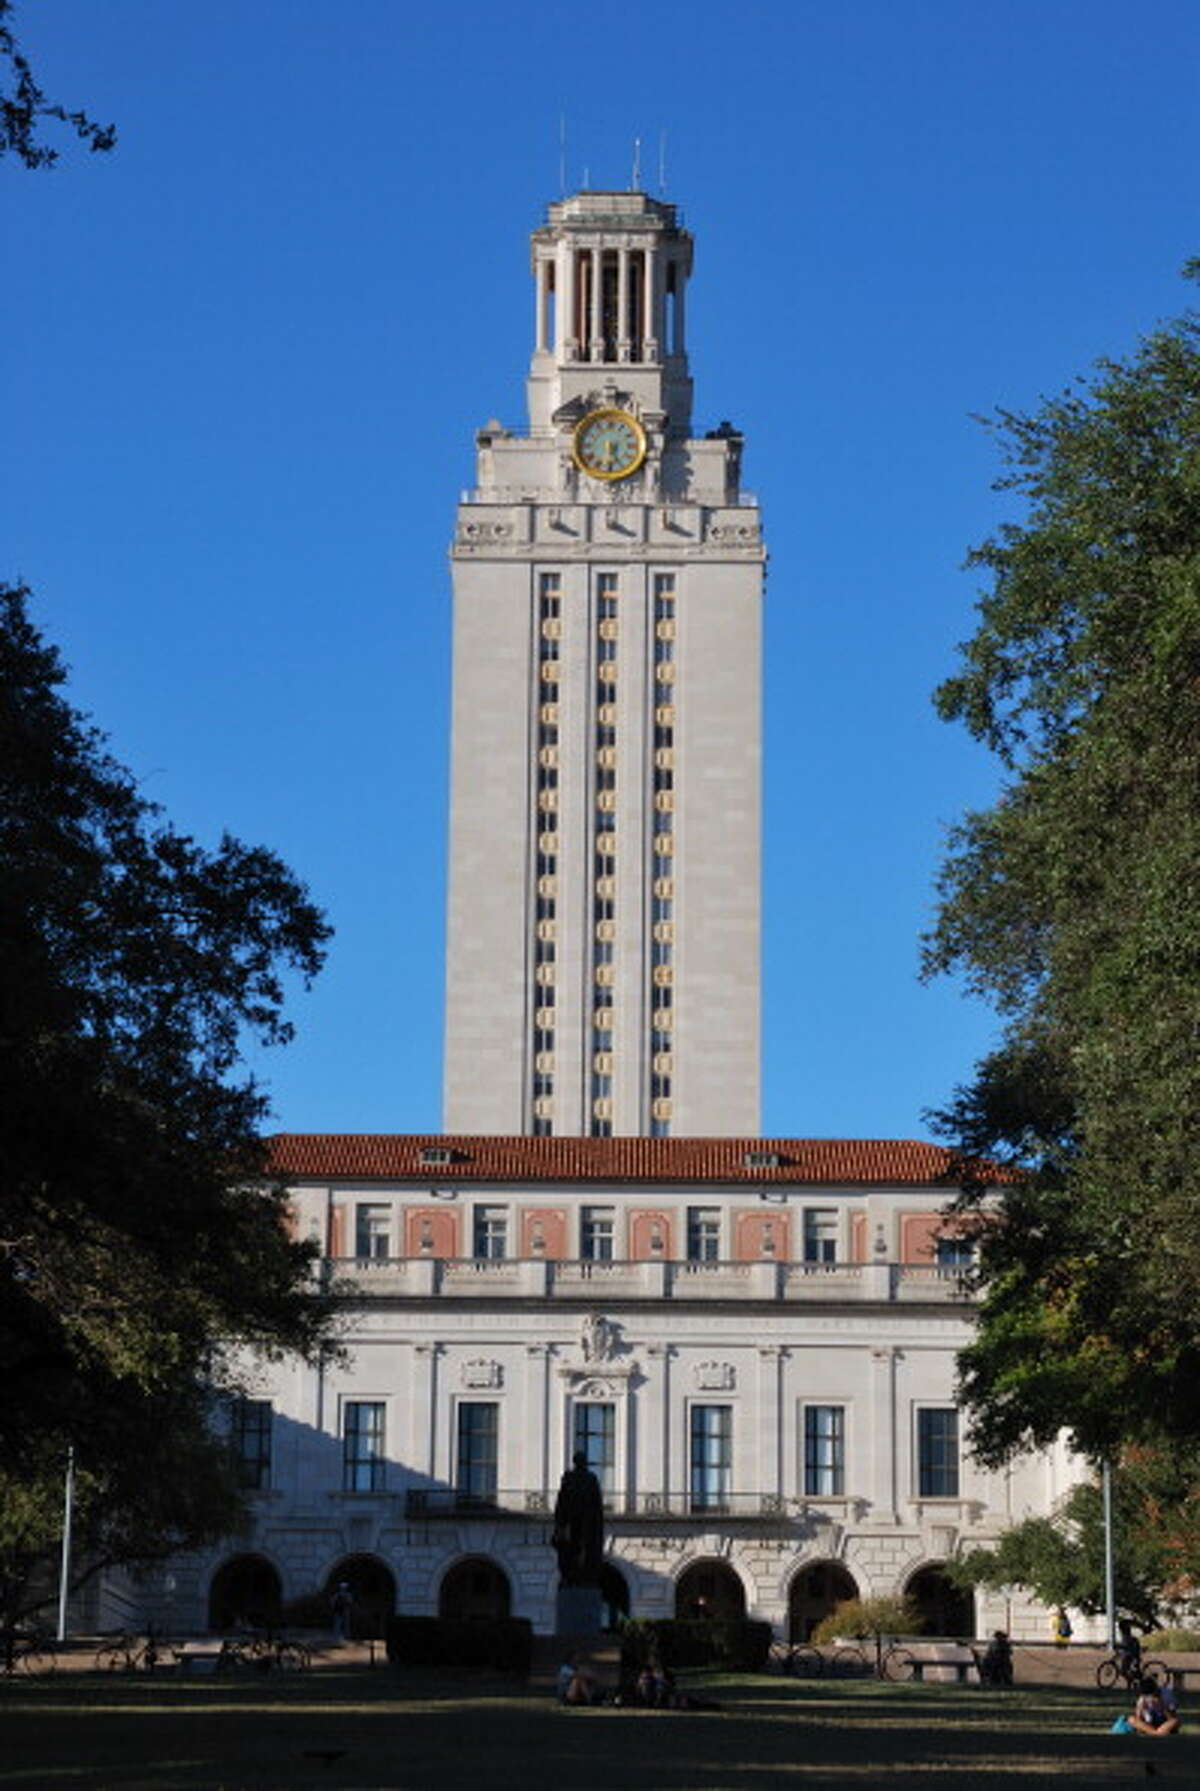 24. University of Texas - Austin